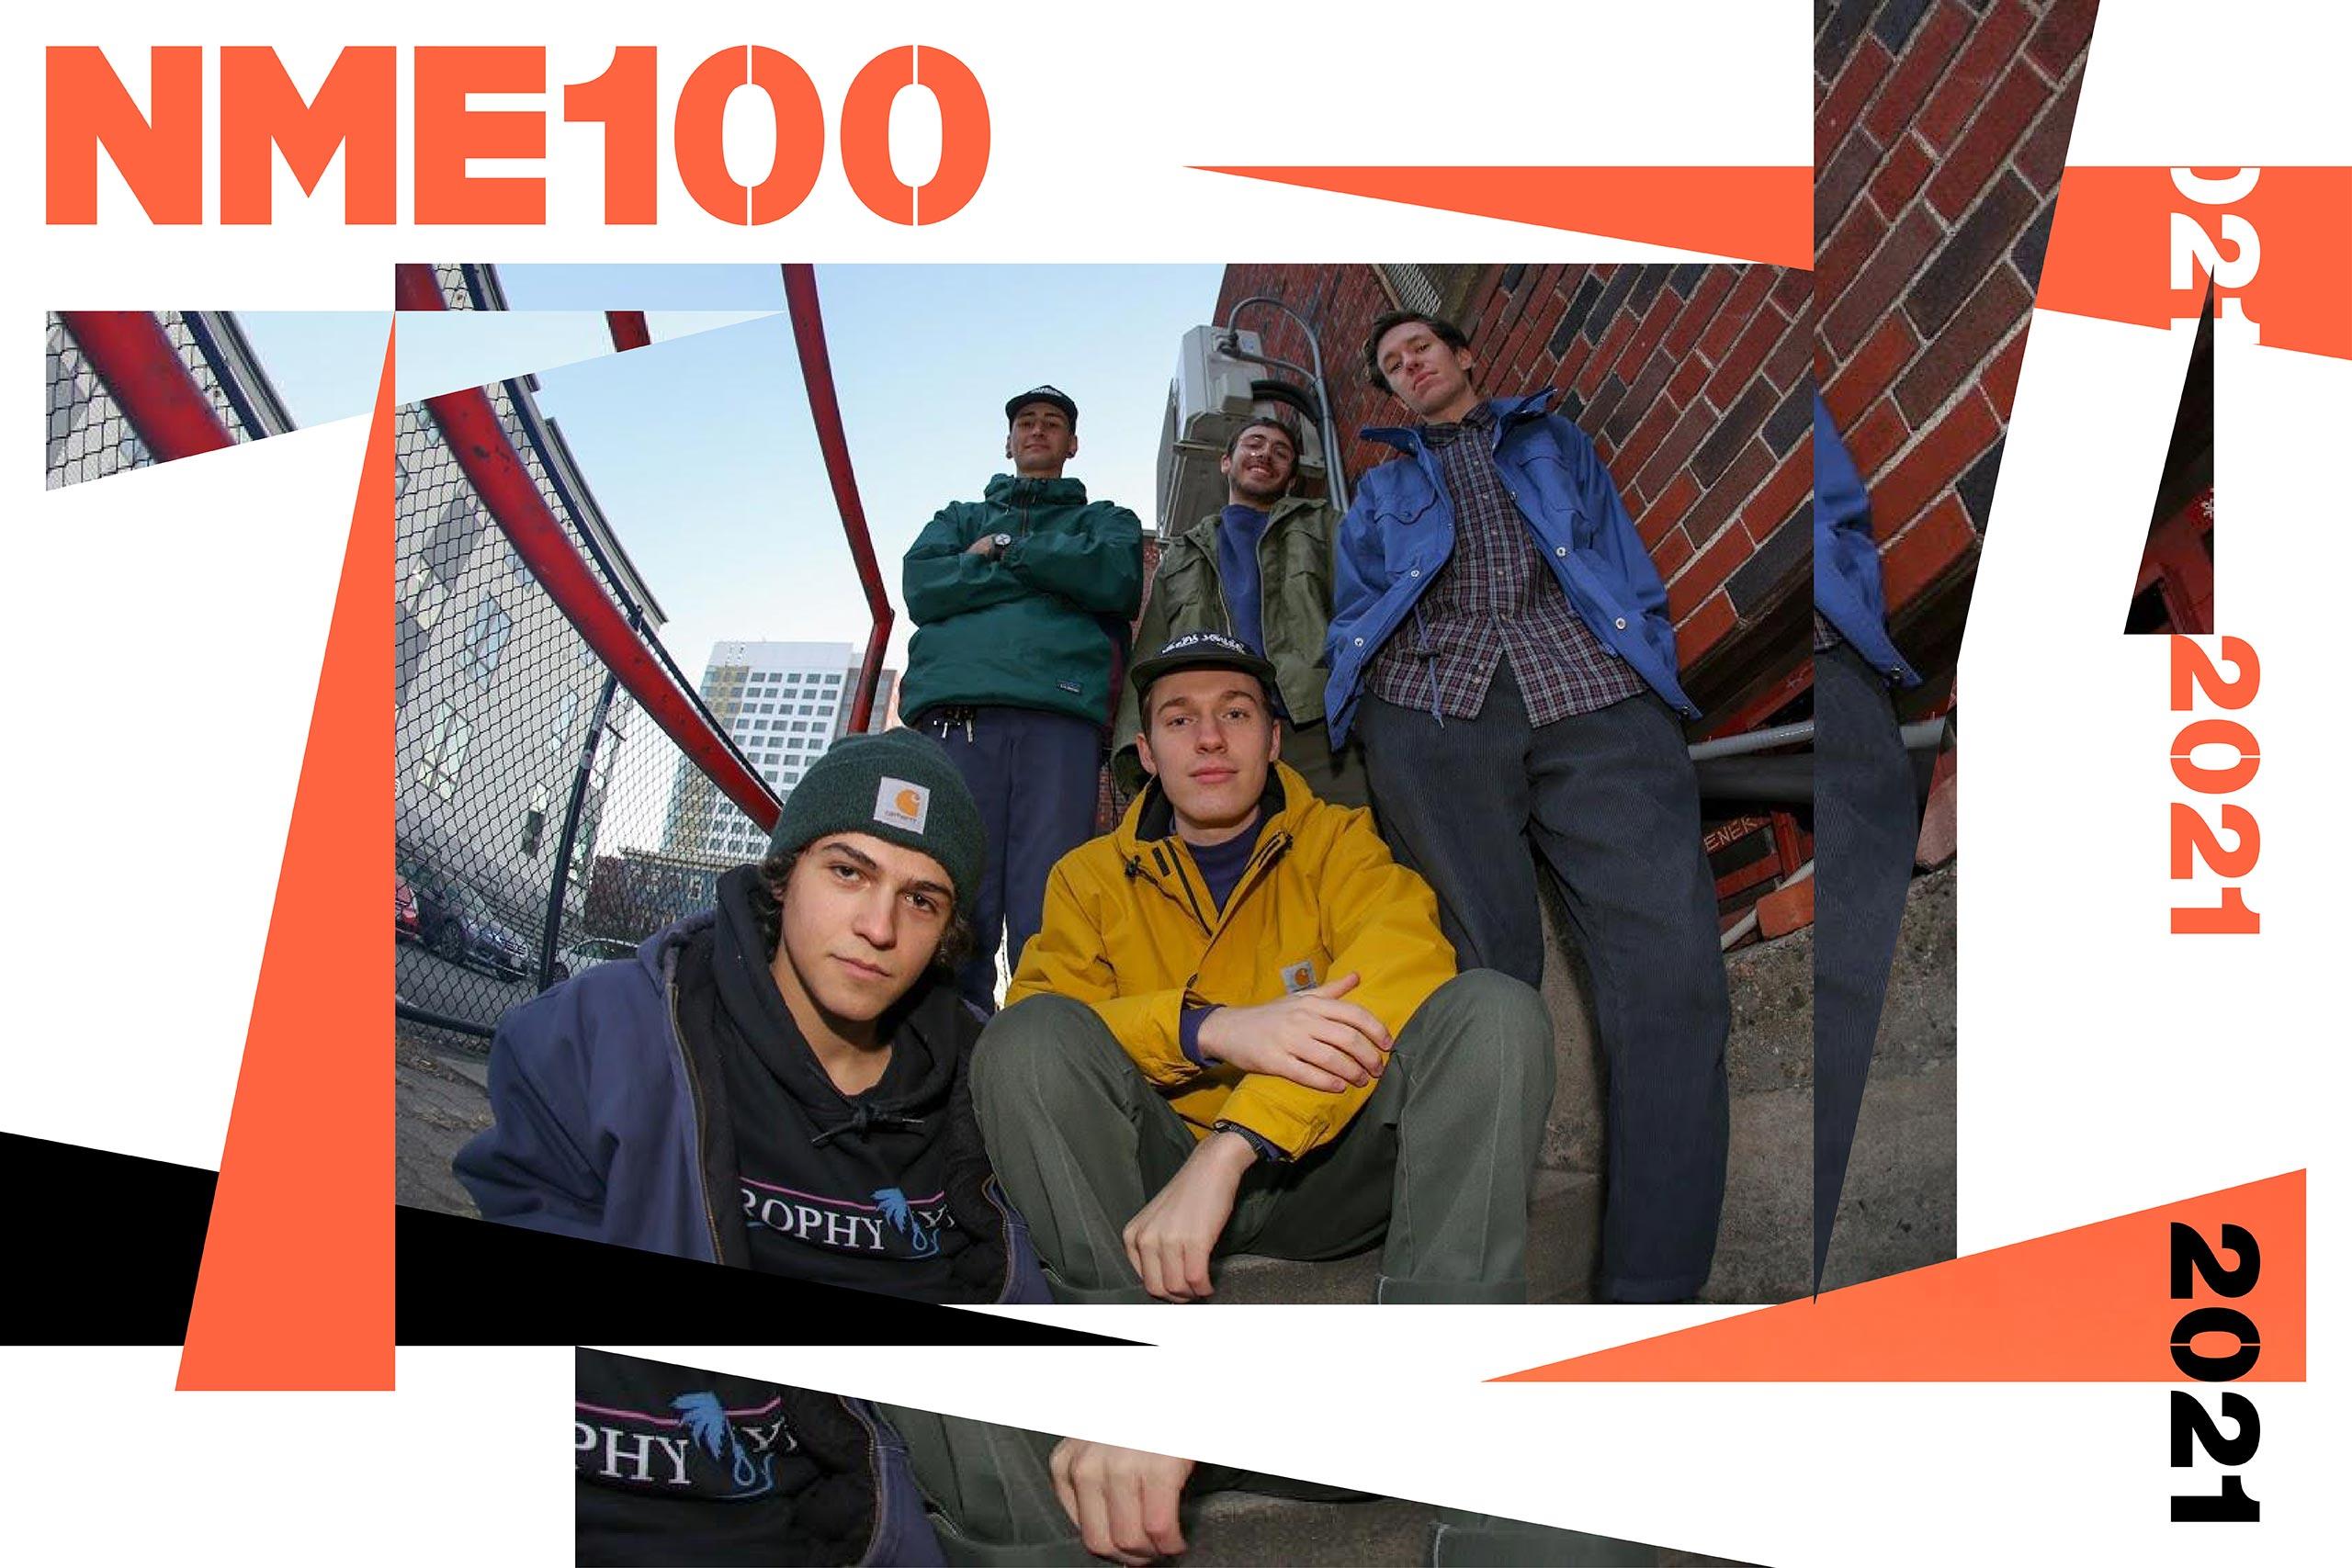 NME 100 anxious